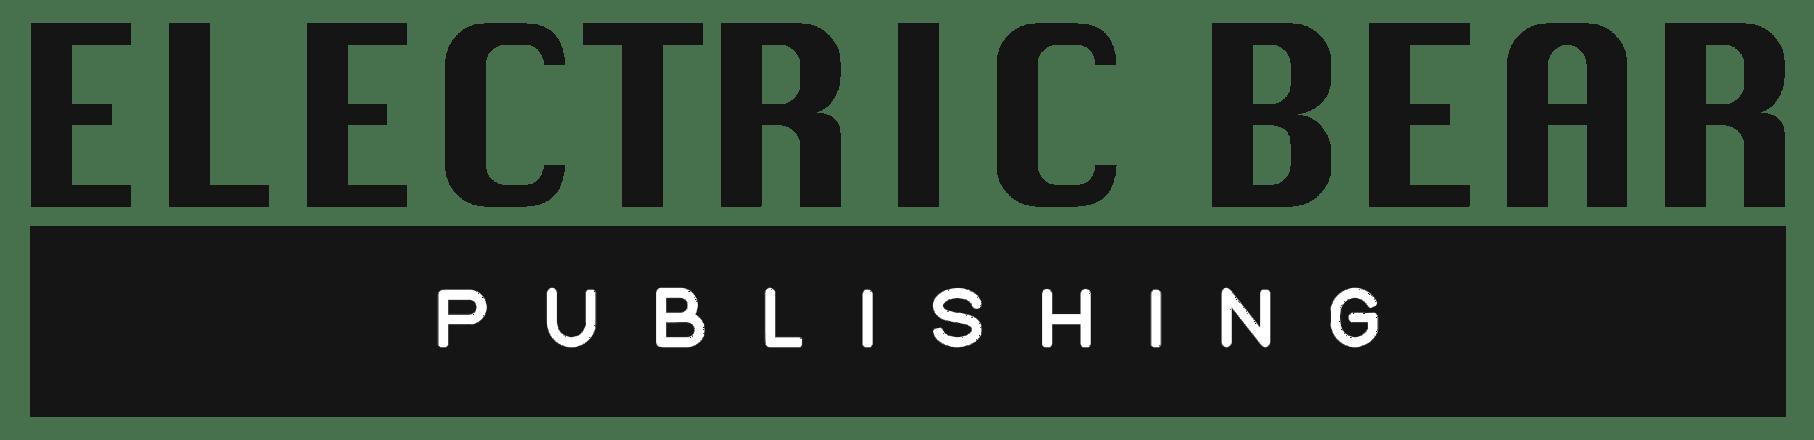 electric bear publishing